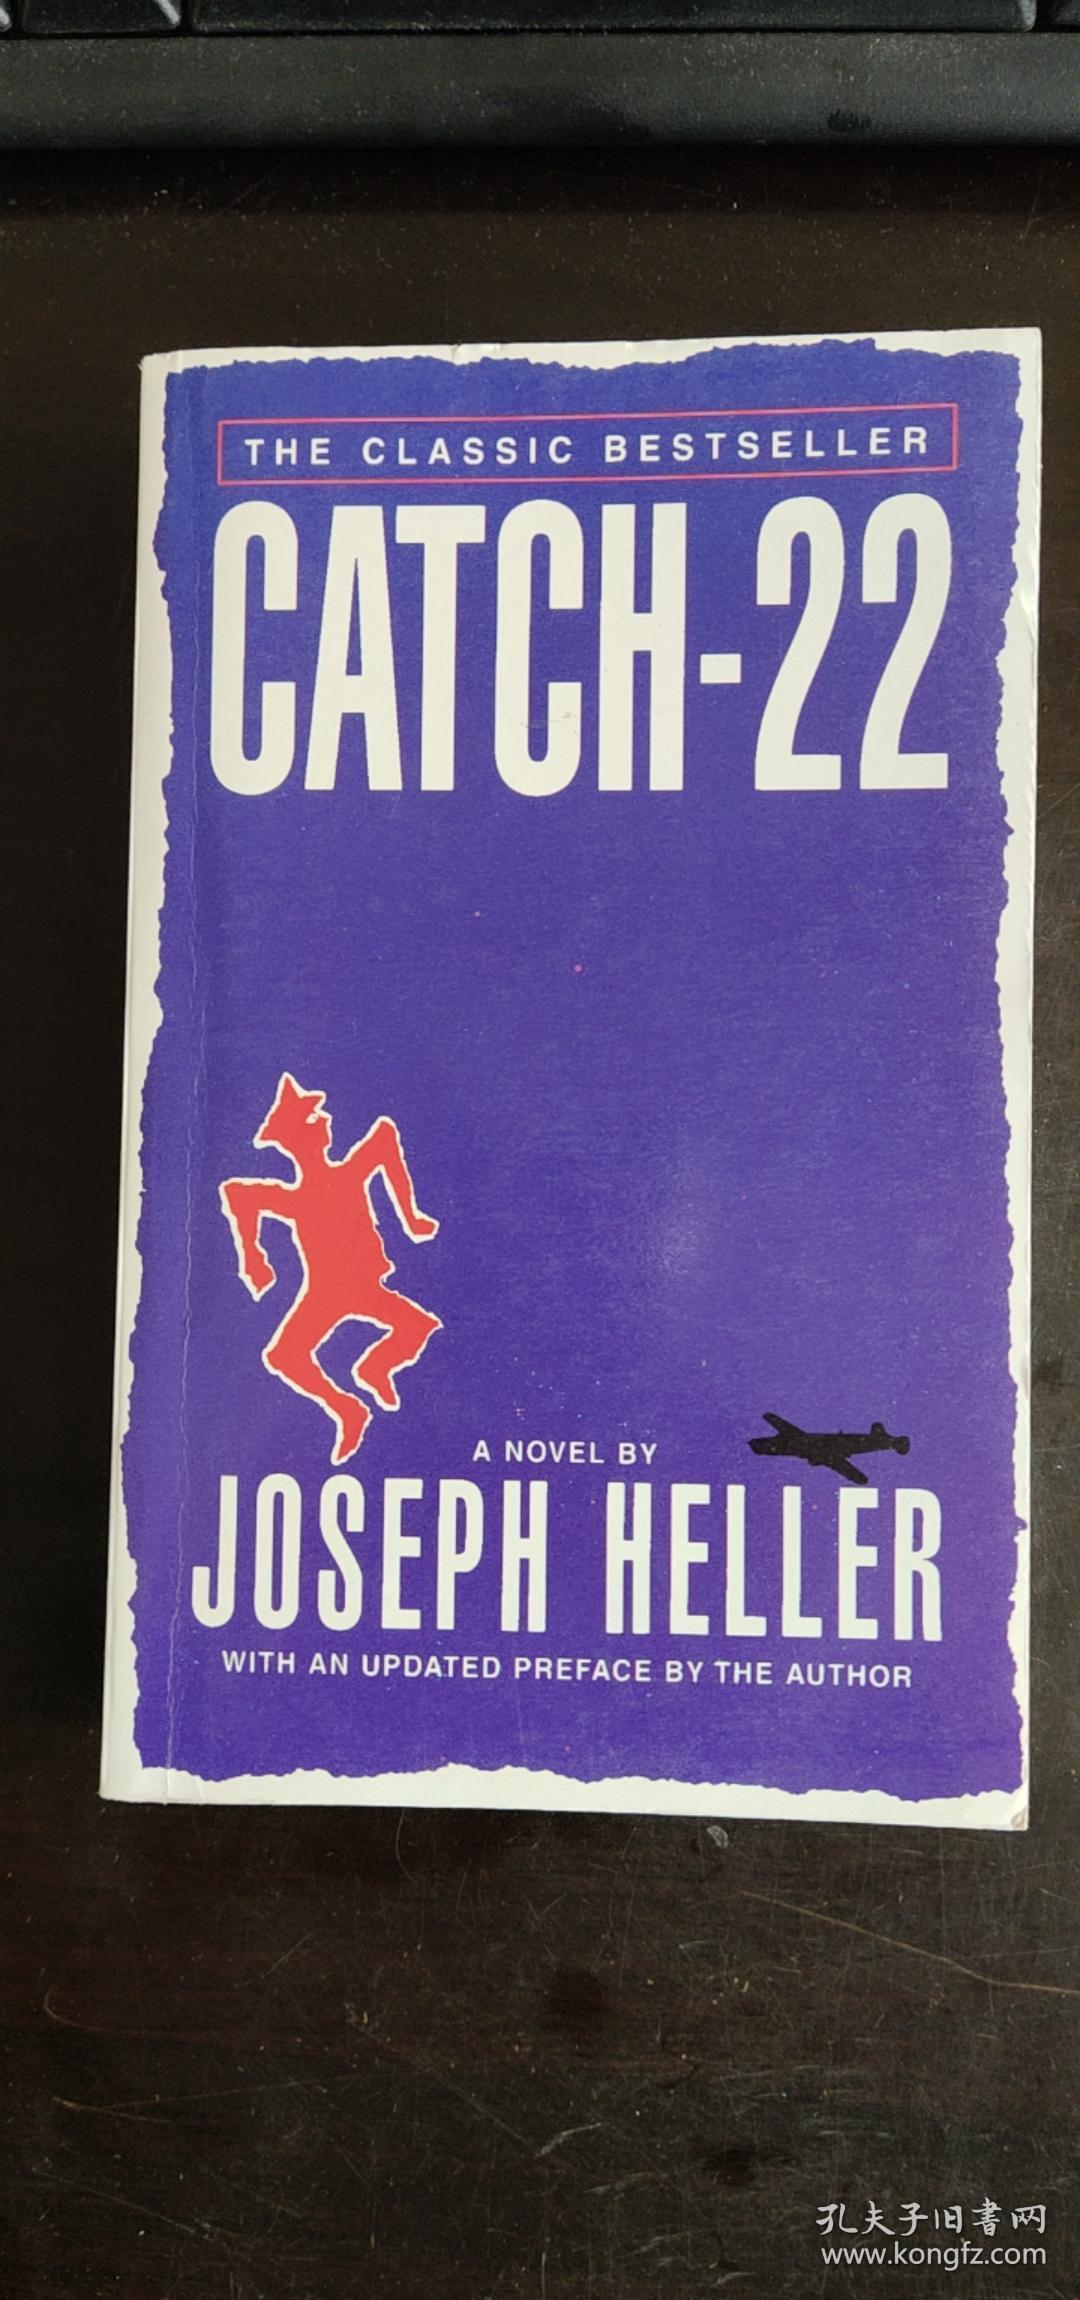 Catch-22 英文原版-《第二十二条军规》 Joseph Heller 约瑟夫·海勒 / Prentice Hall (a Pearson Education Company)